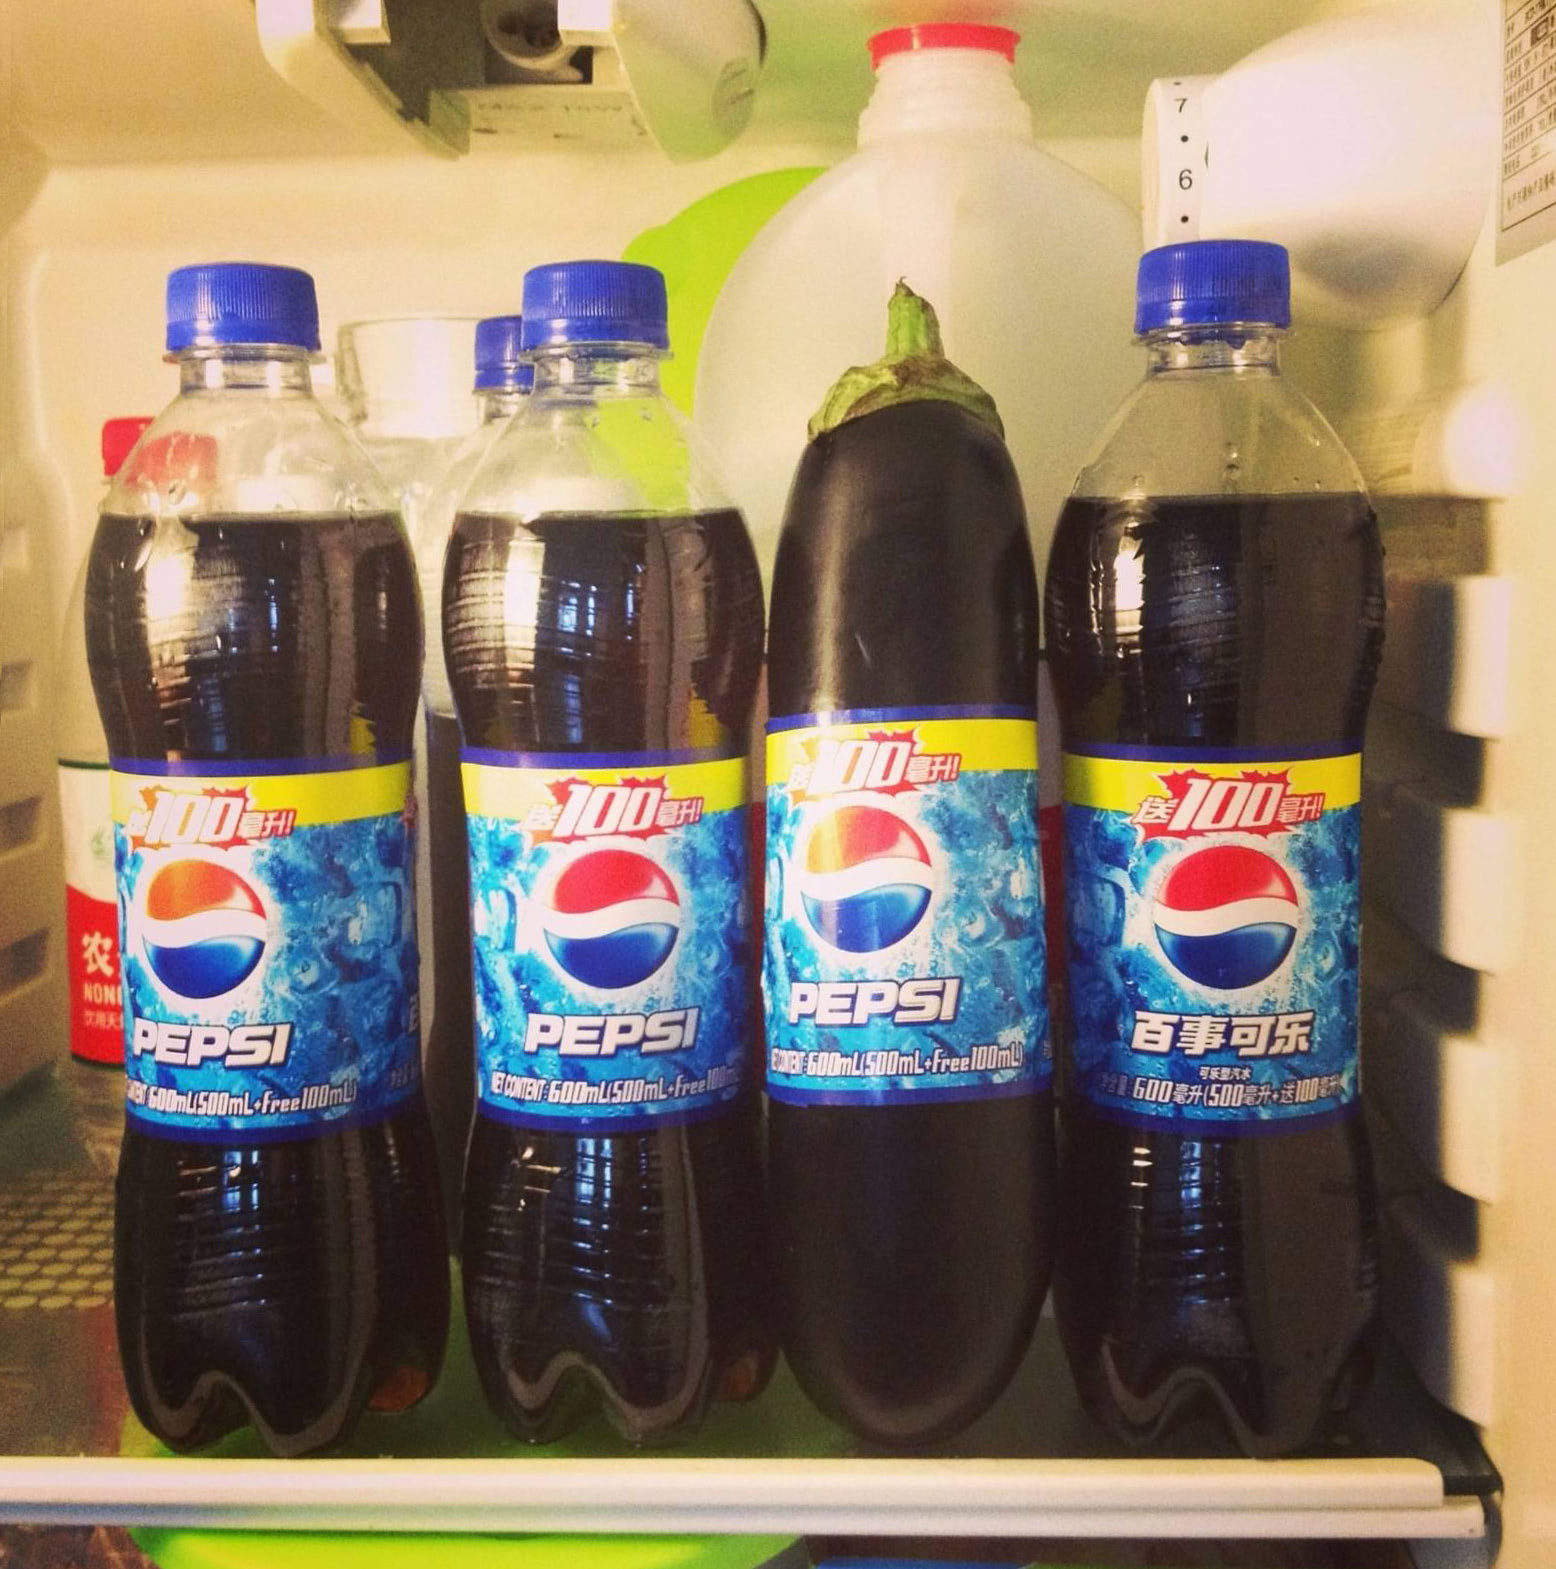 Visual of Pepsi Aubergine